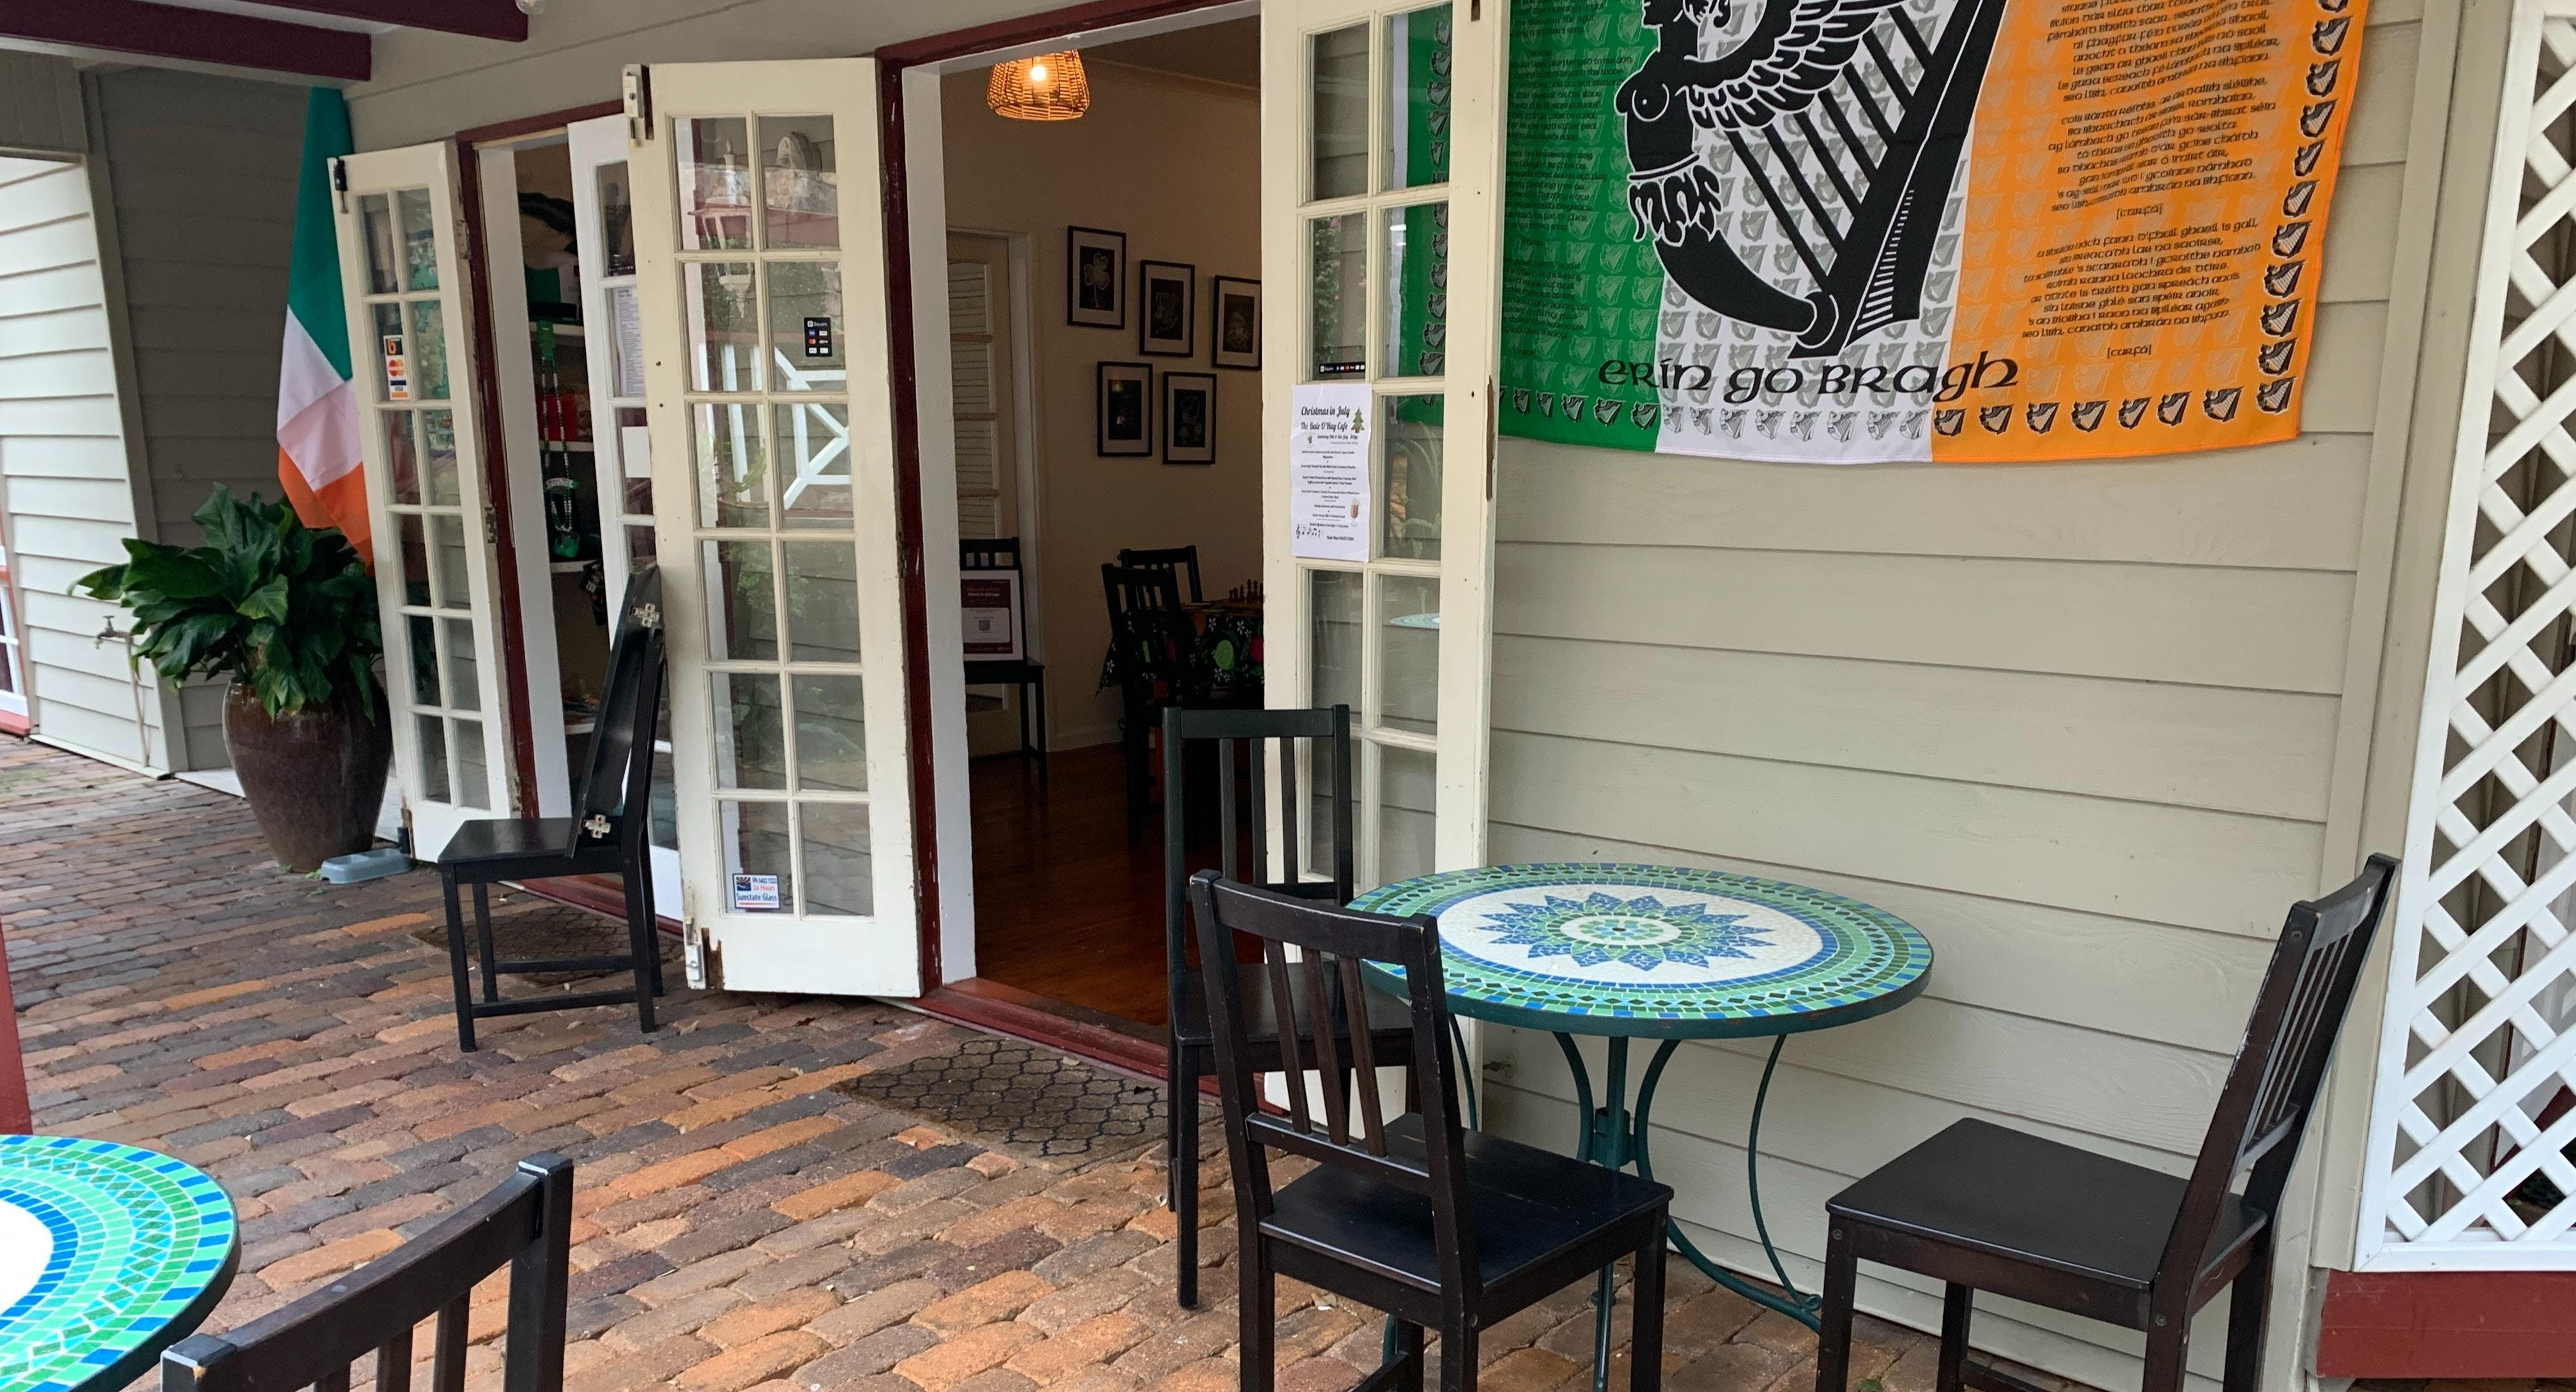 Photo of restaurant Bale O'Hay Cafe in Montville, Sunshine Coast